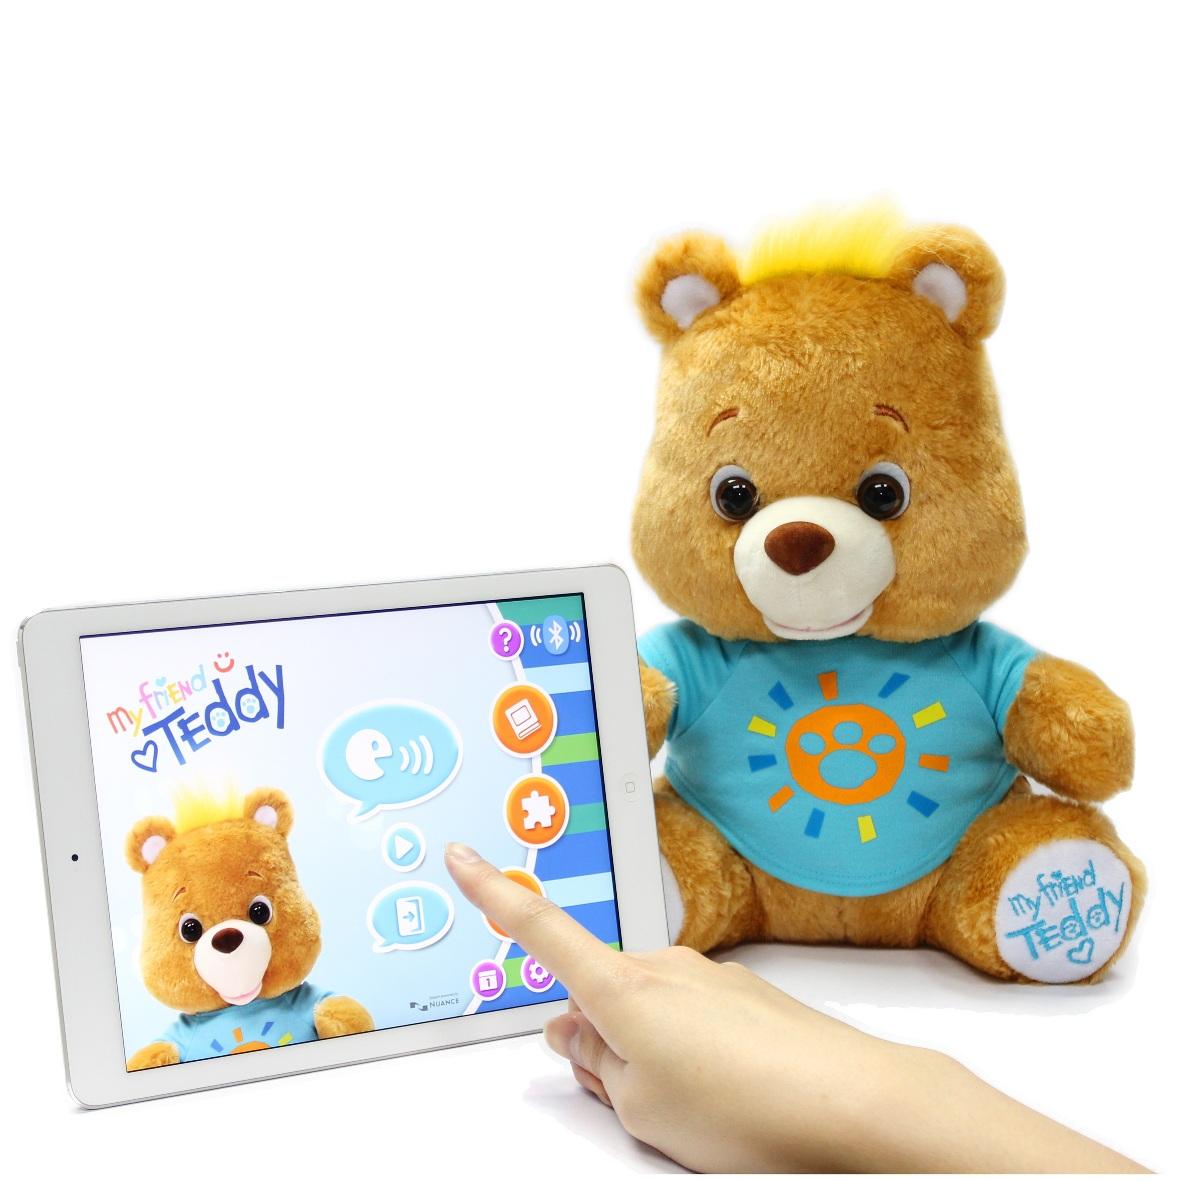 My Friend Teddy He S The Teddy Bear Your Kids Will Love